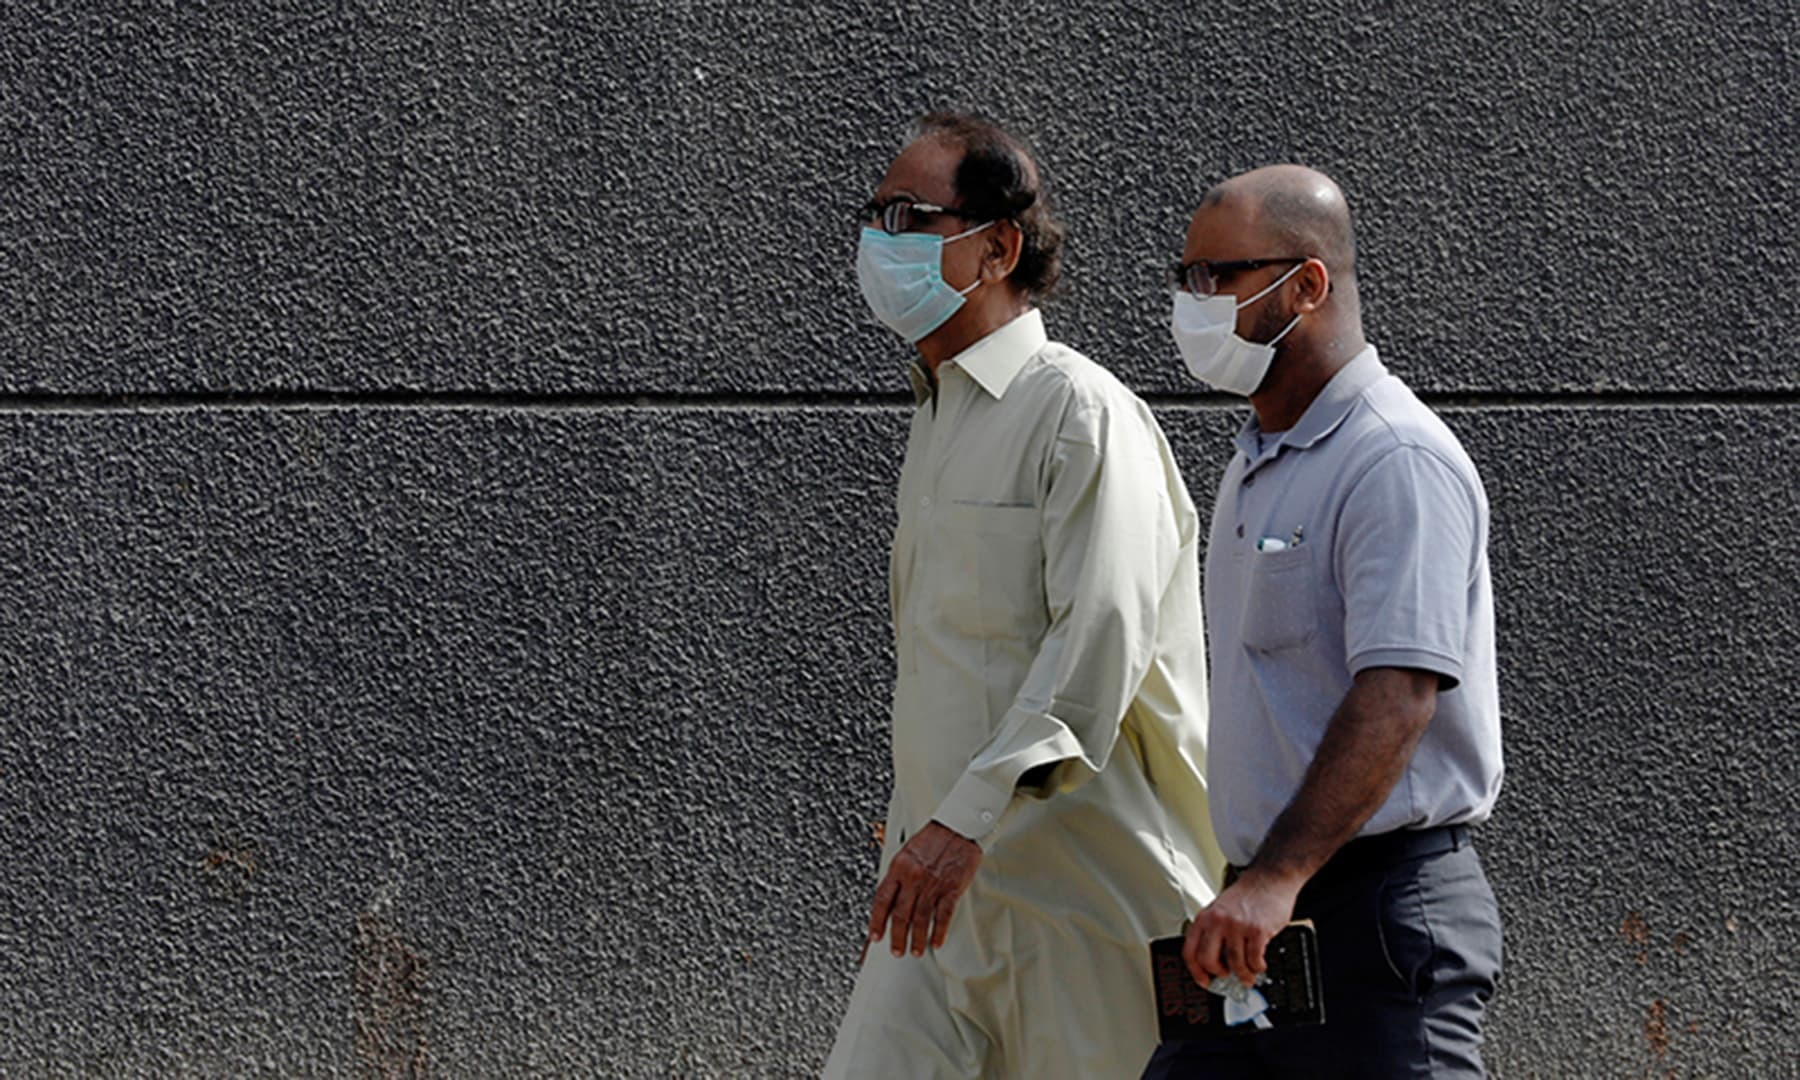 Men walk with face masks as a preventive measure along a sidewalk in Karachi, Pakistan on February 28. — Reuters/File